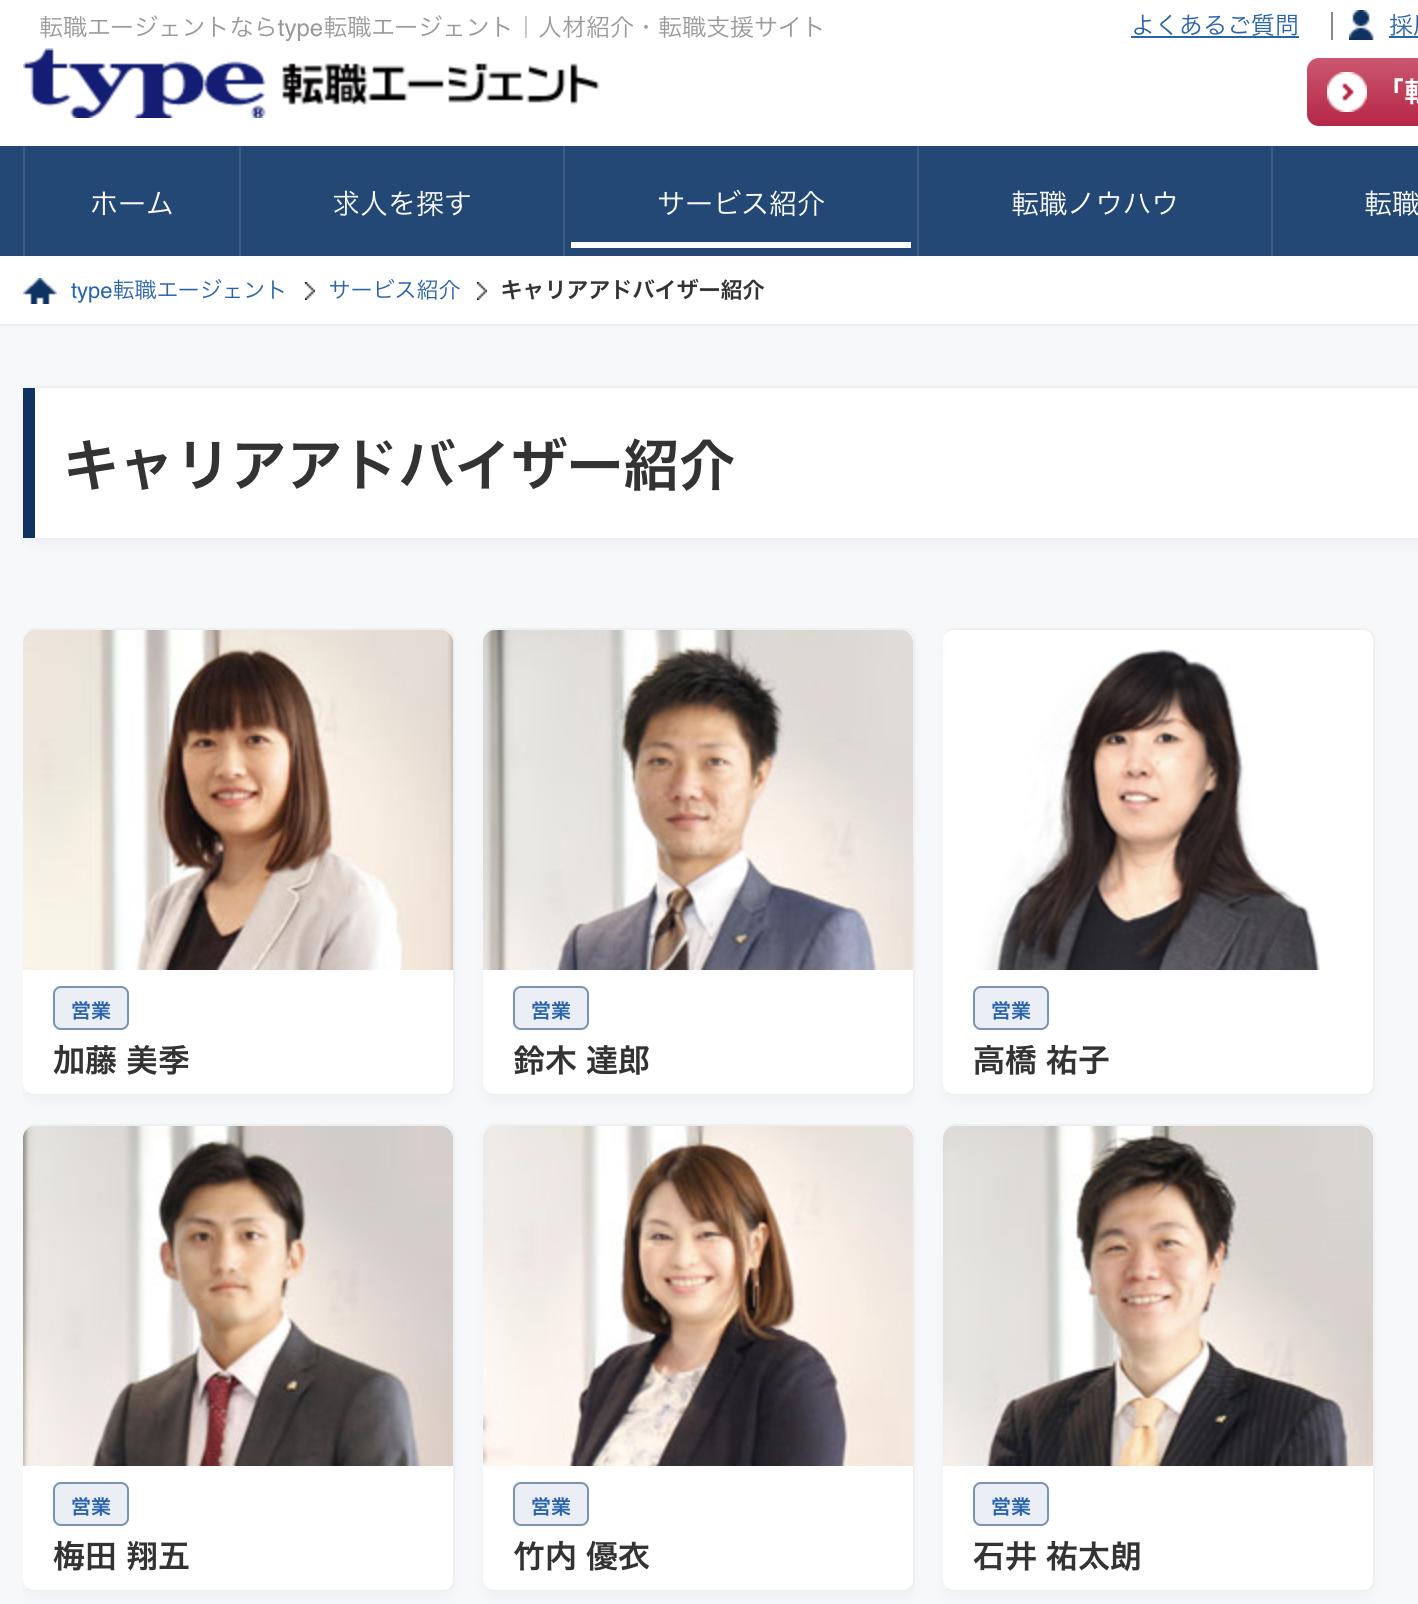 type転職エージェントの営業の転職専任のキャリアアドバイザー